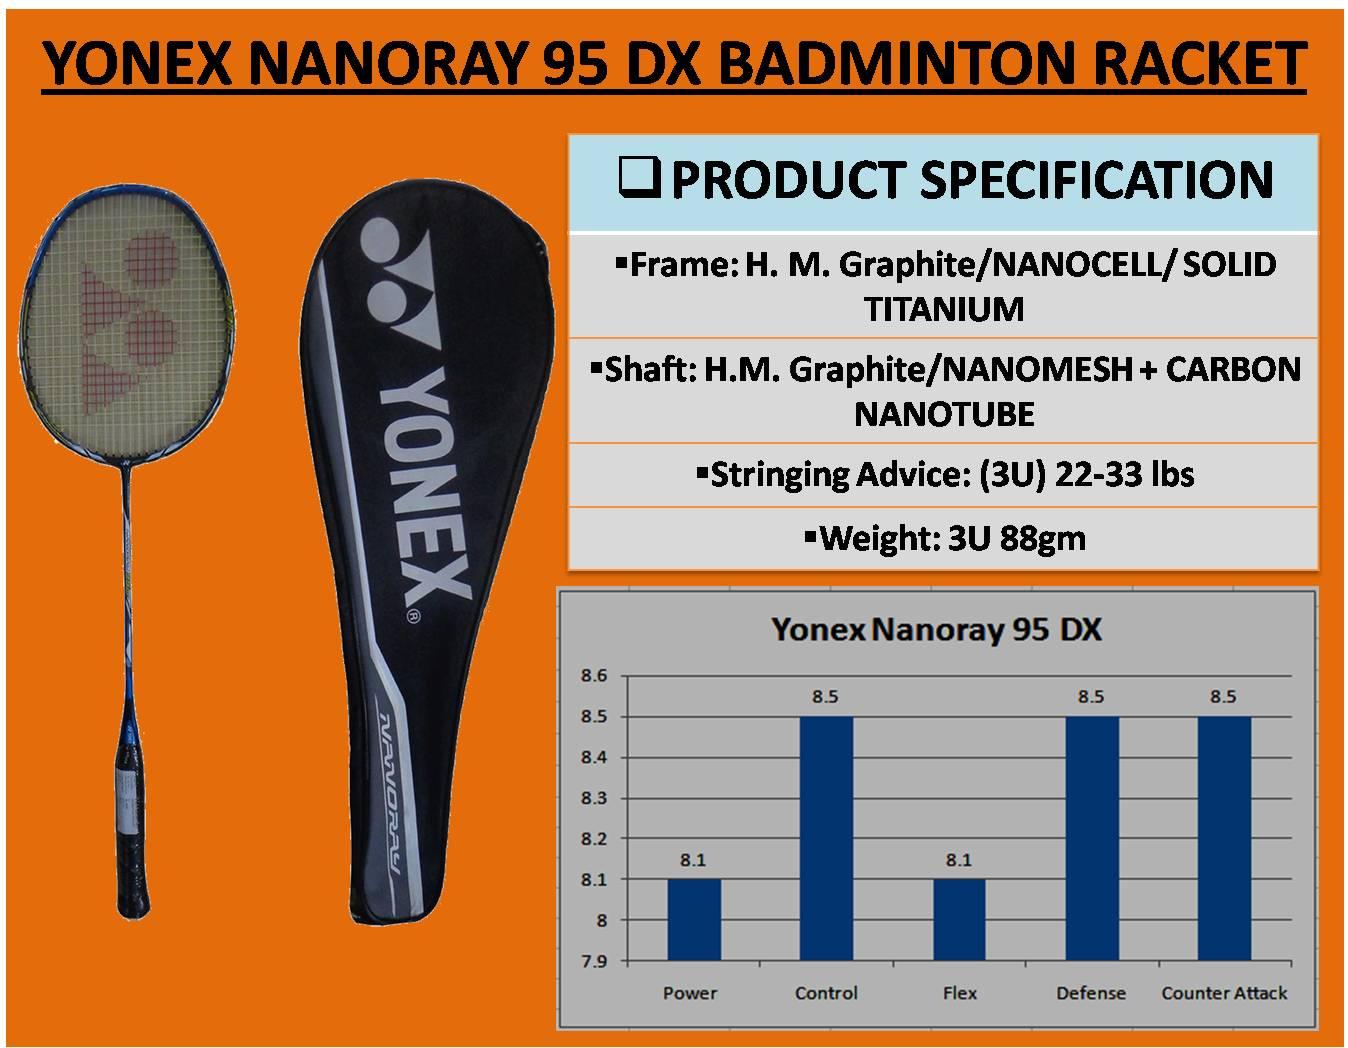 YONEX NANORAY 95 DX BADMINTON RACKET